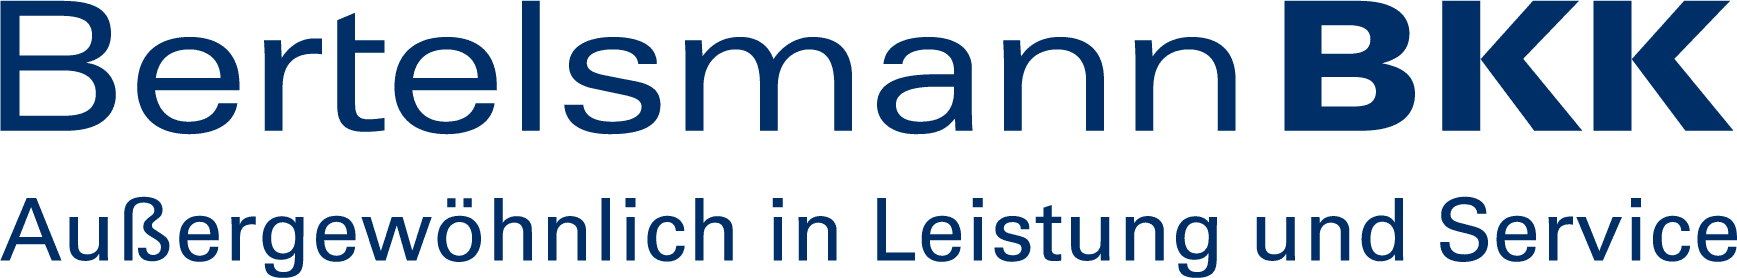 Signavio Bertelsmann BKK Customer Logo